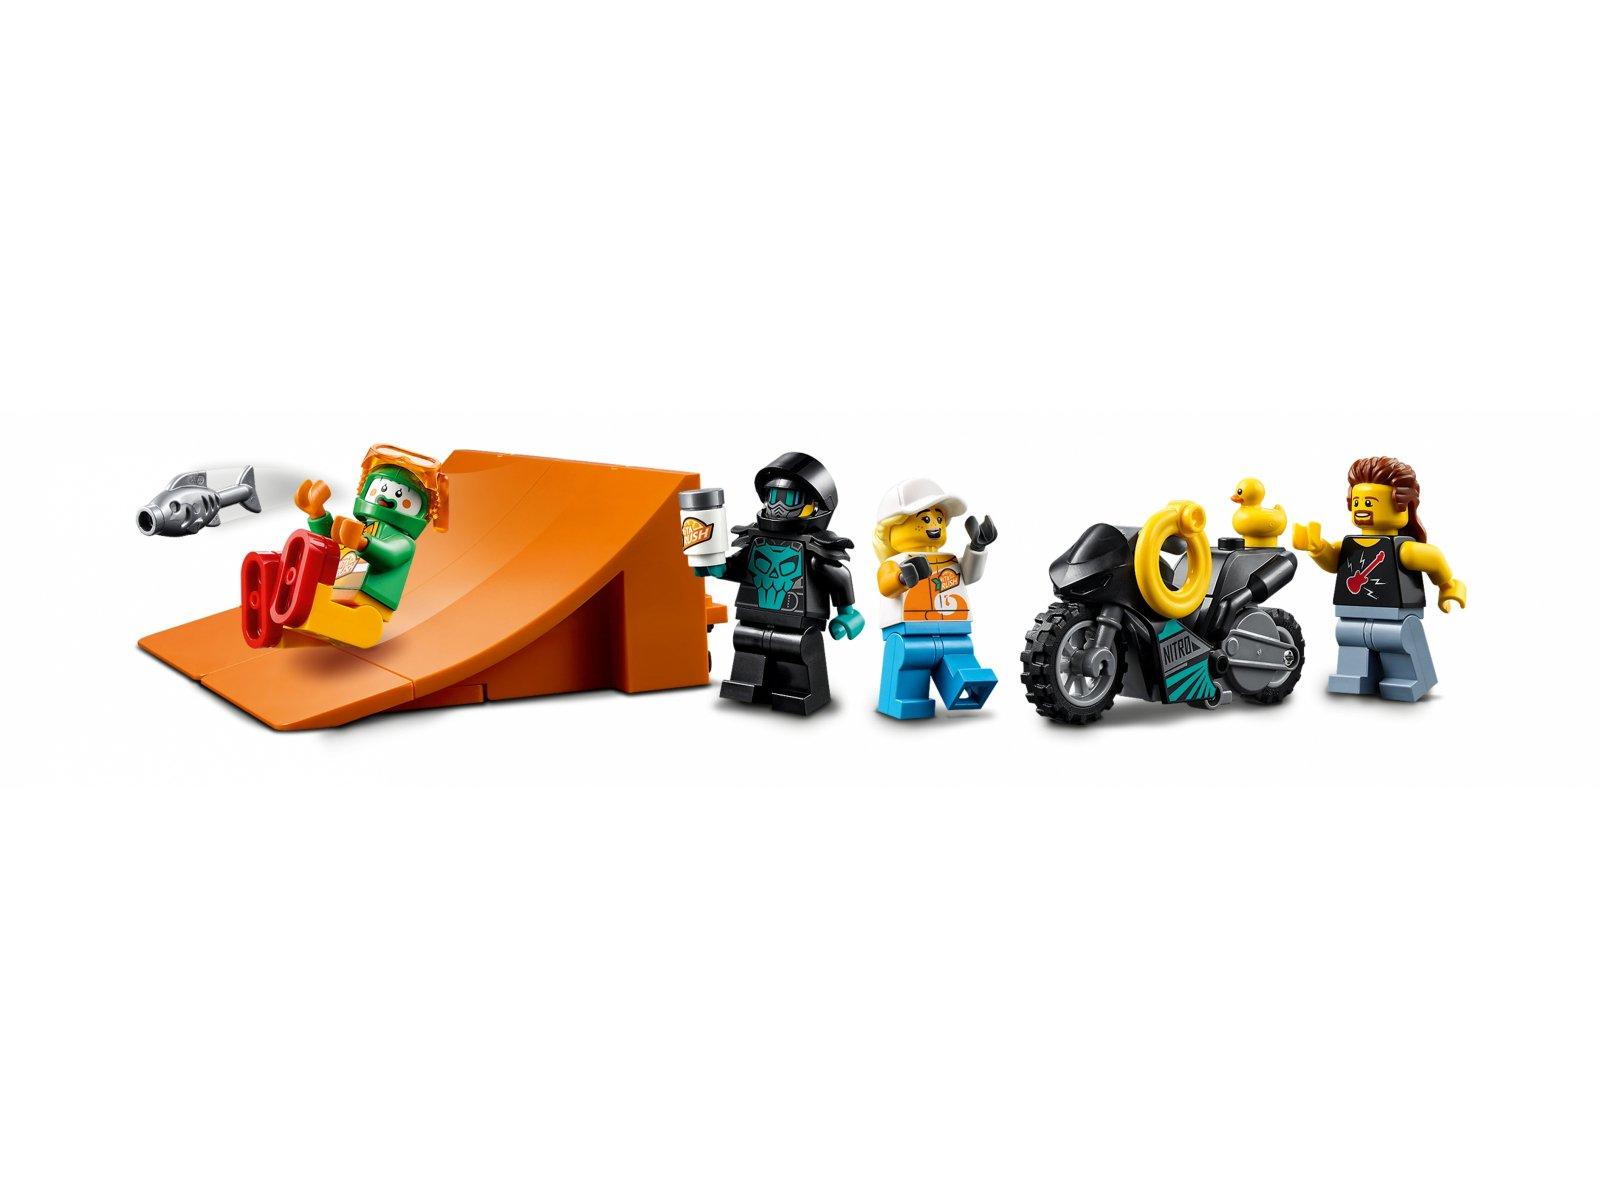 LEGO 60294 City Ciężarówka kaskaderska